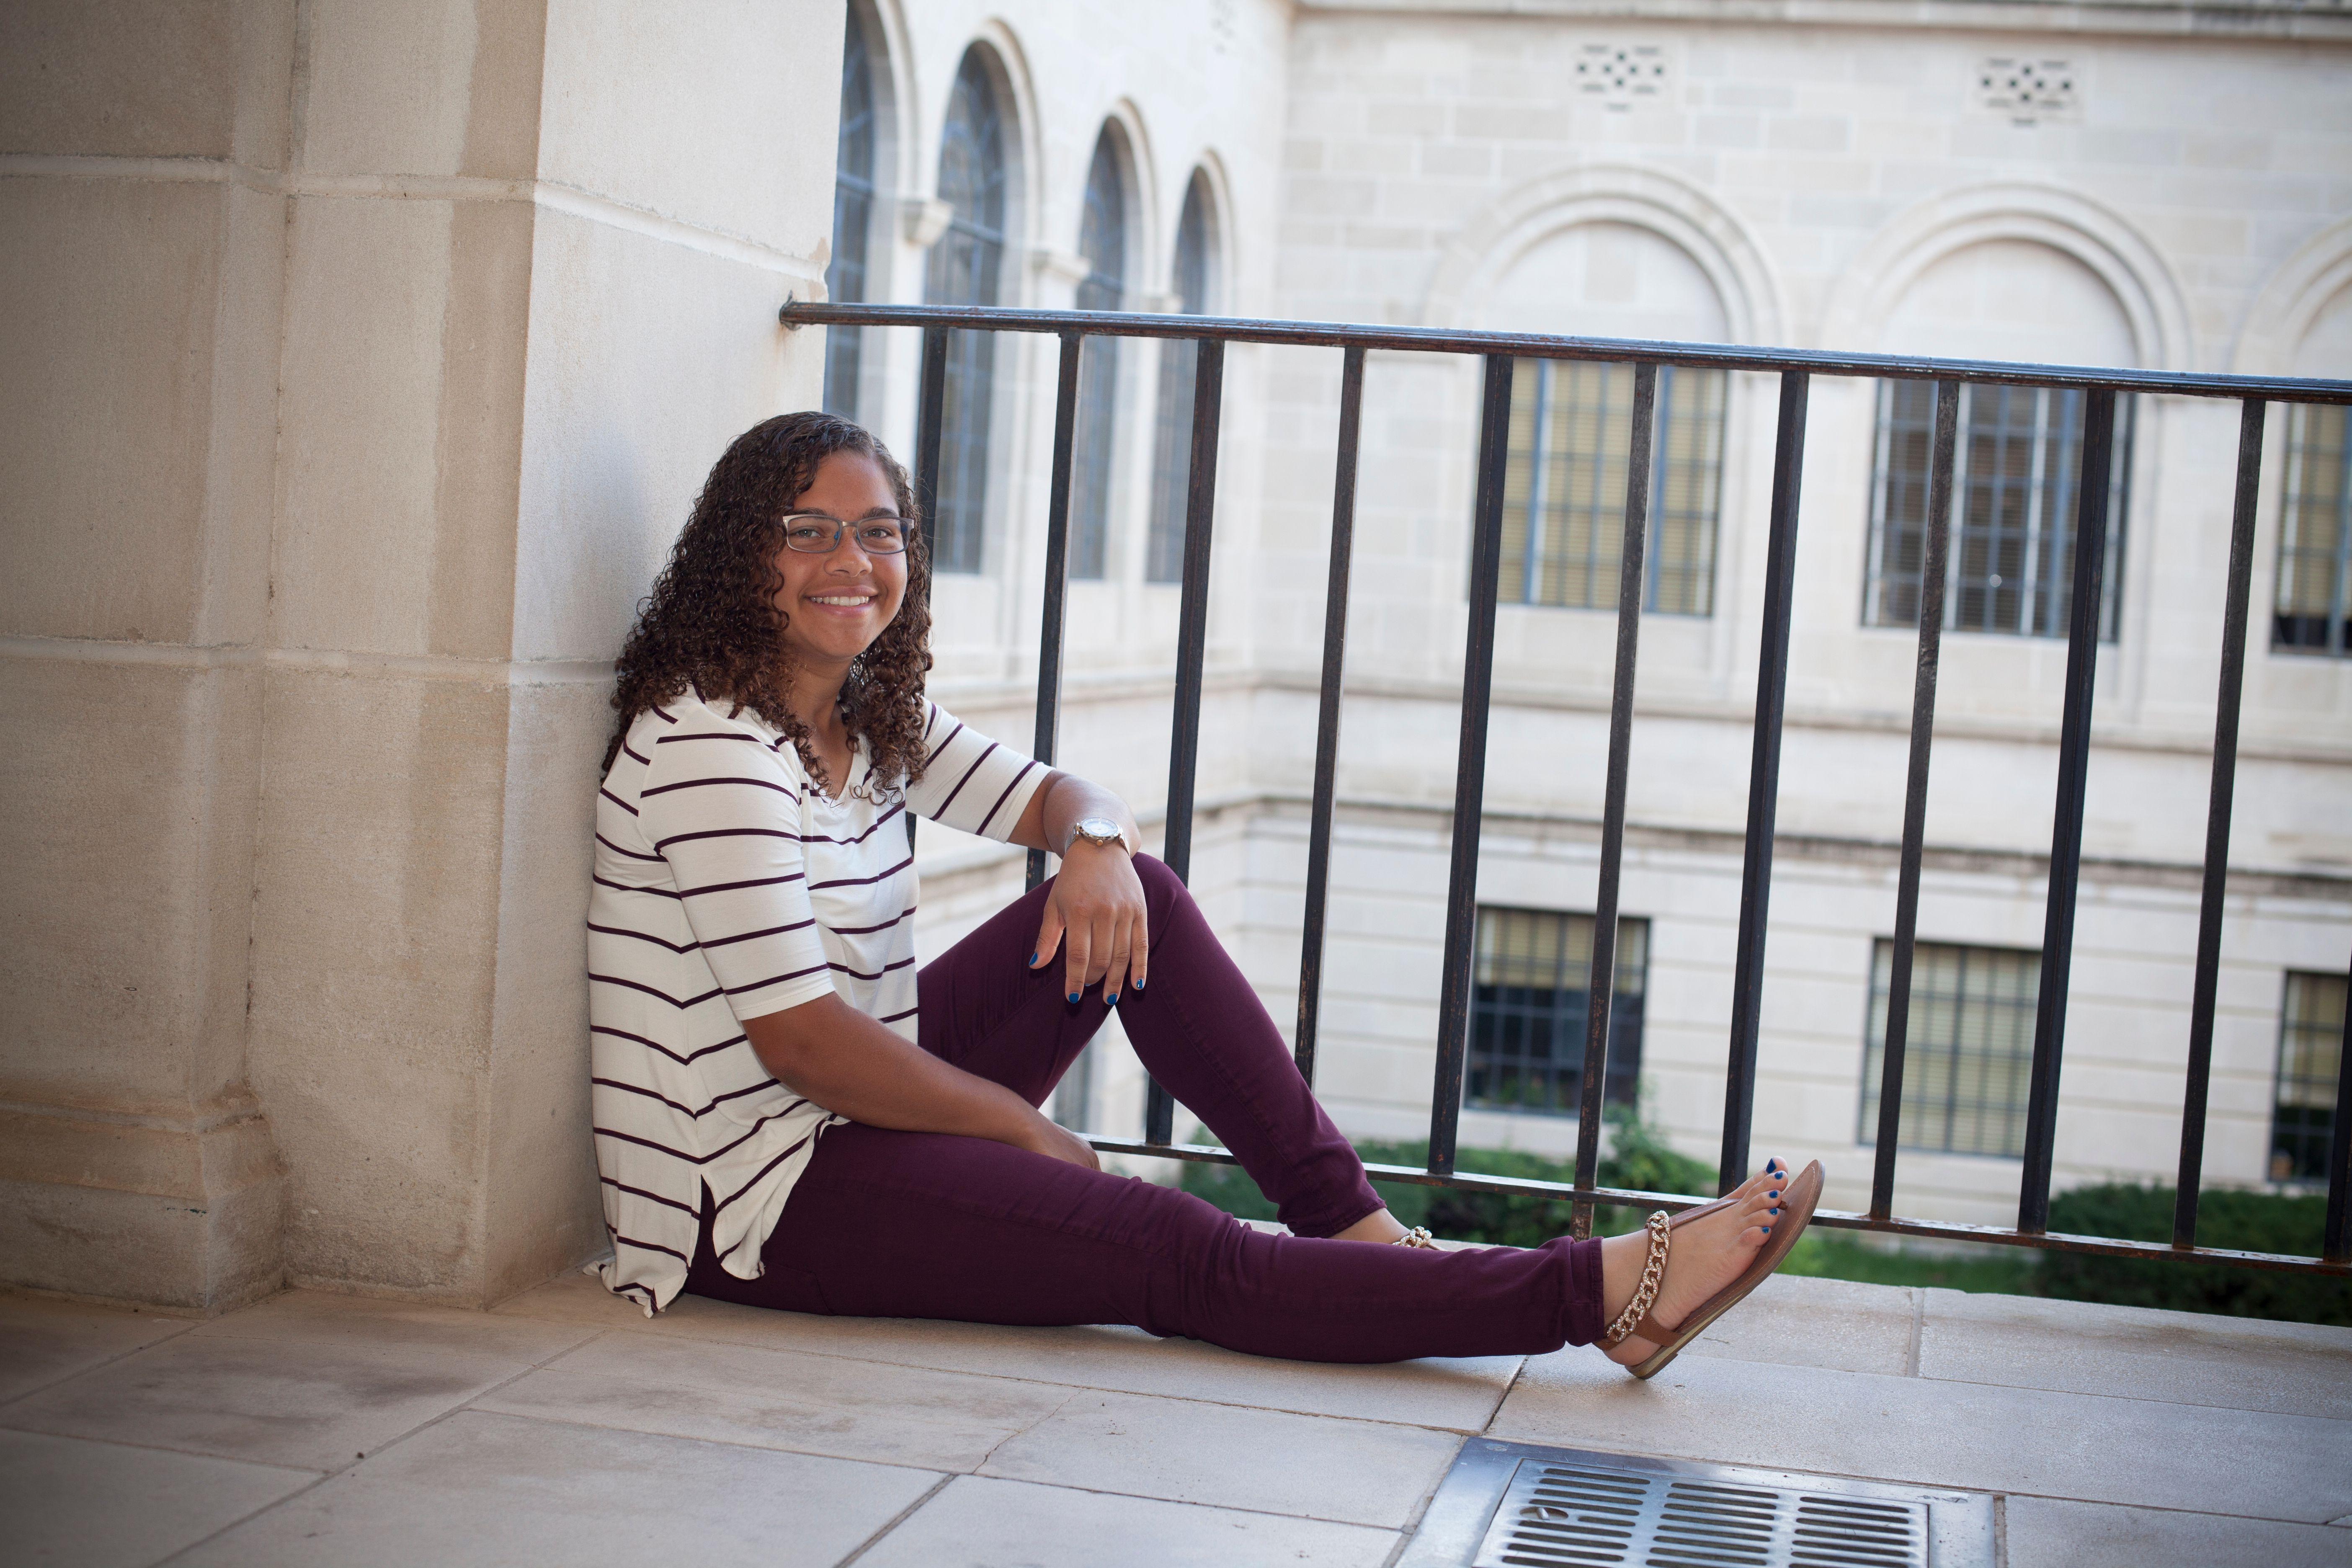 Carstons Scholar - Kamryn Sannicks